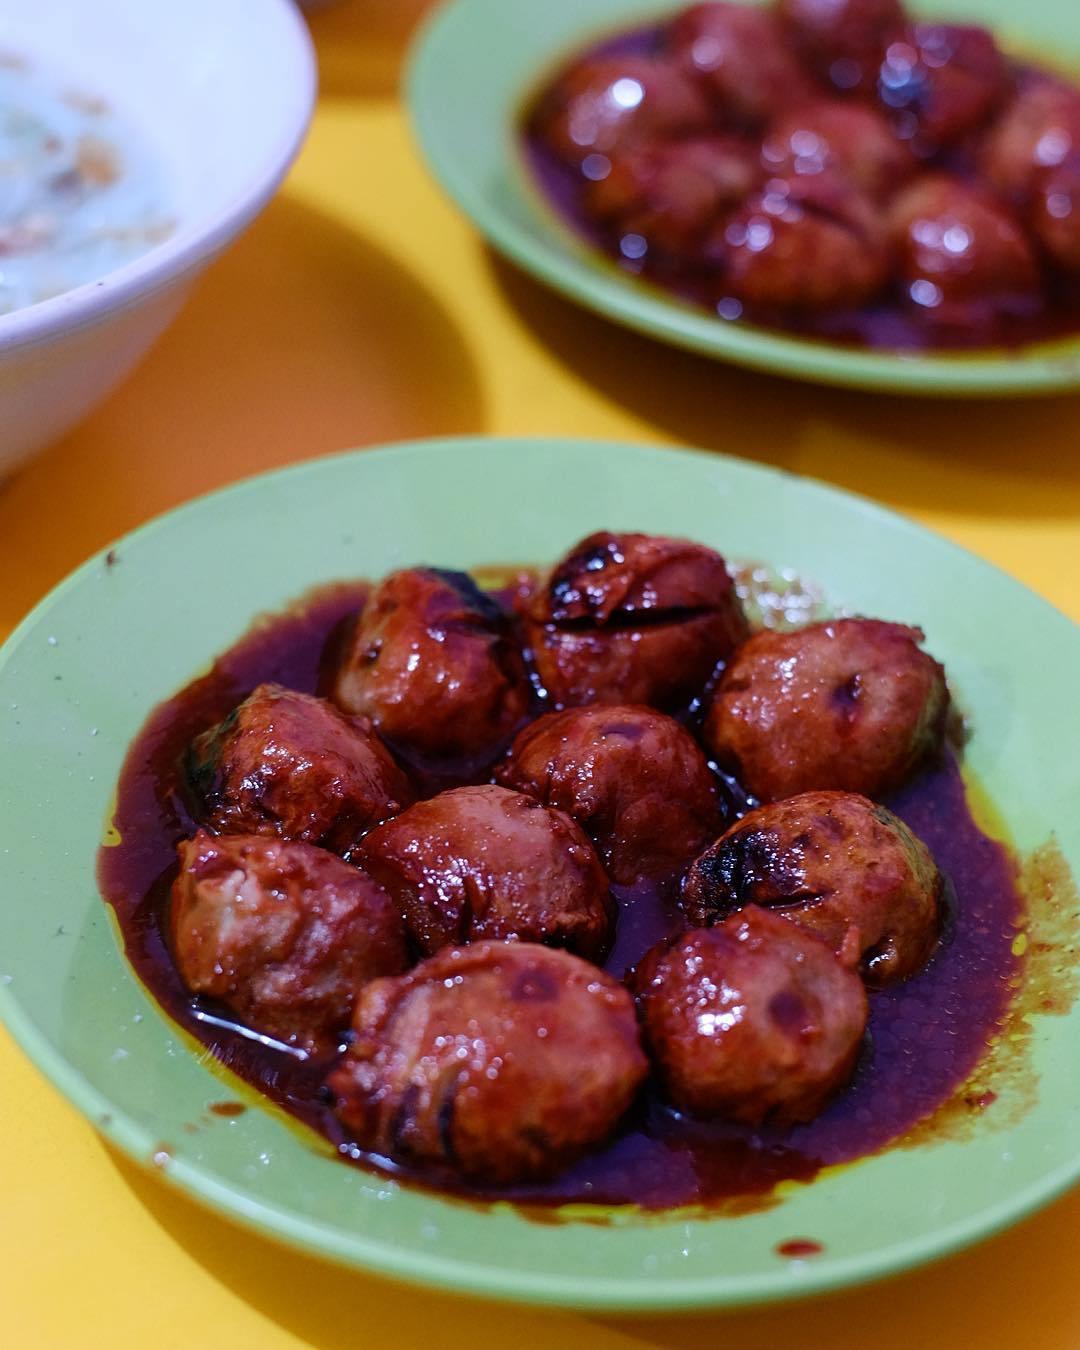 Wisata kuliner malam di Malang